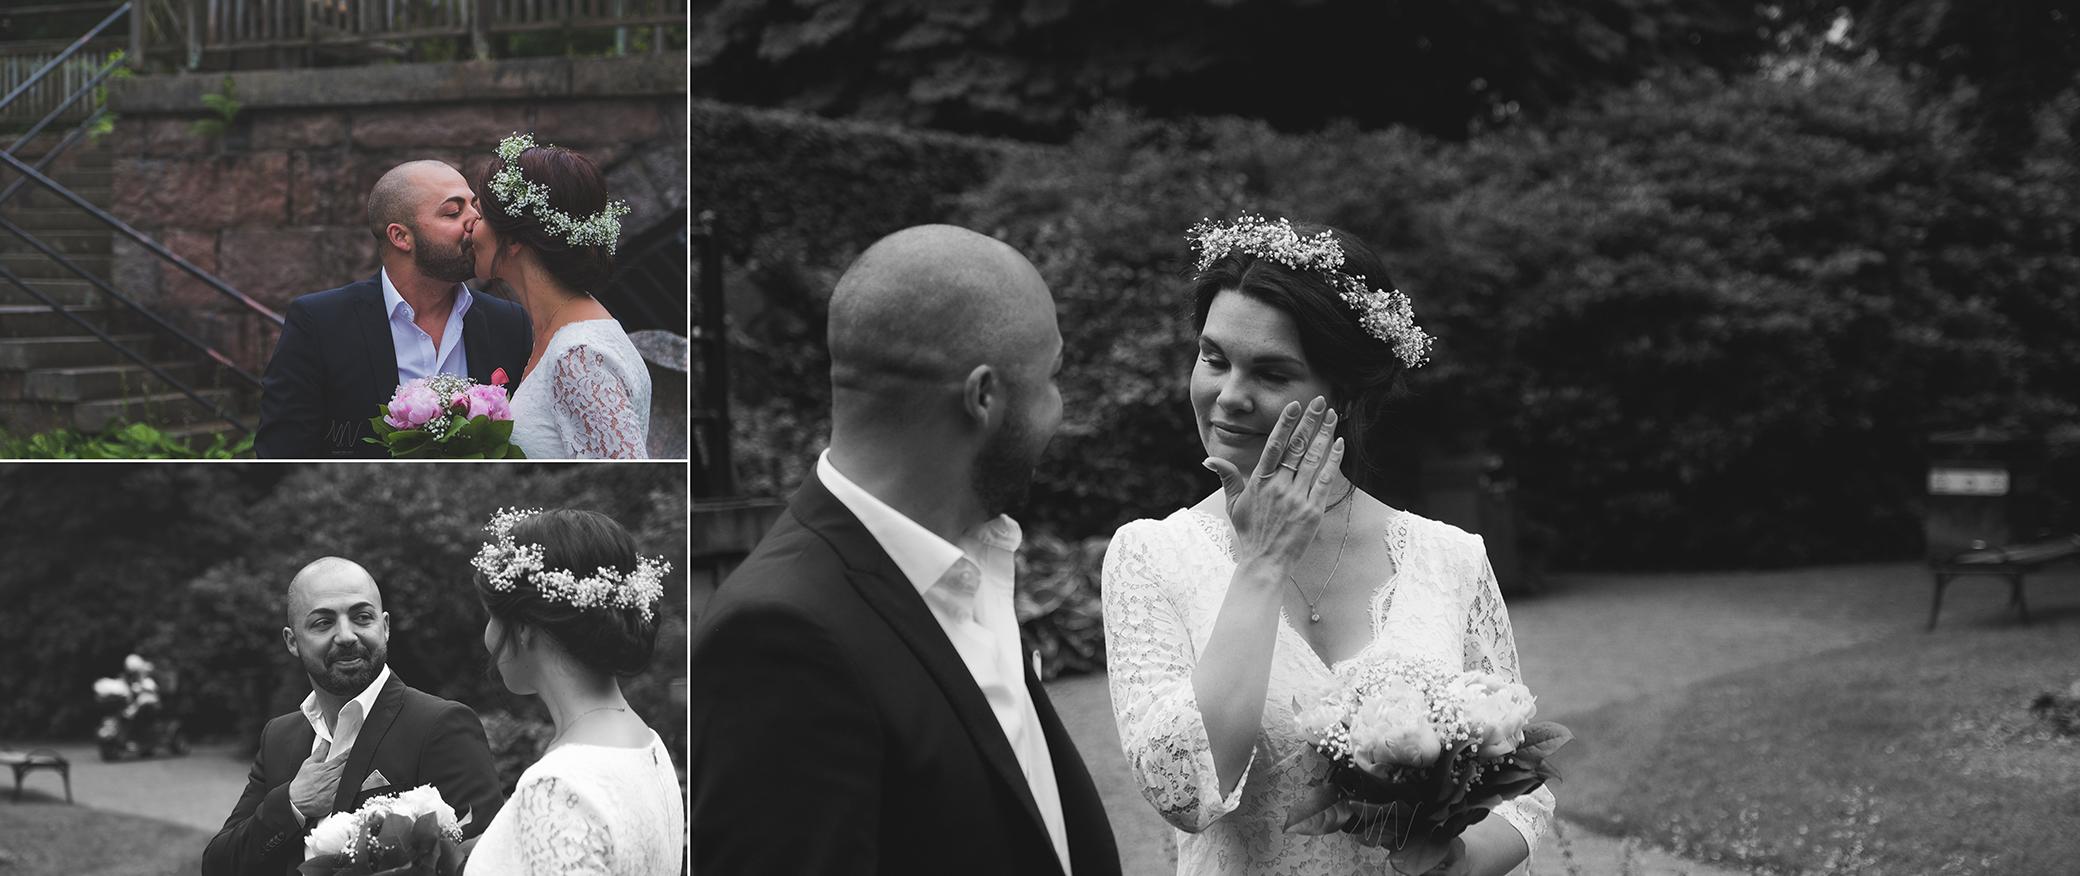 bröllopsfoto-max-norin-triptych.jpg